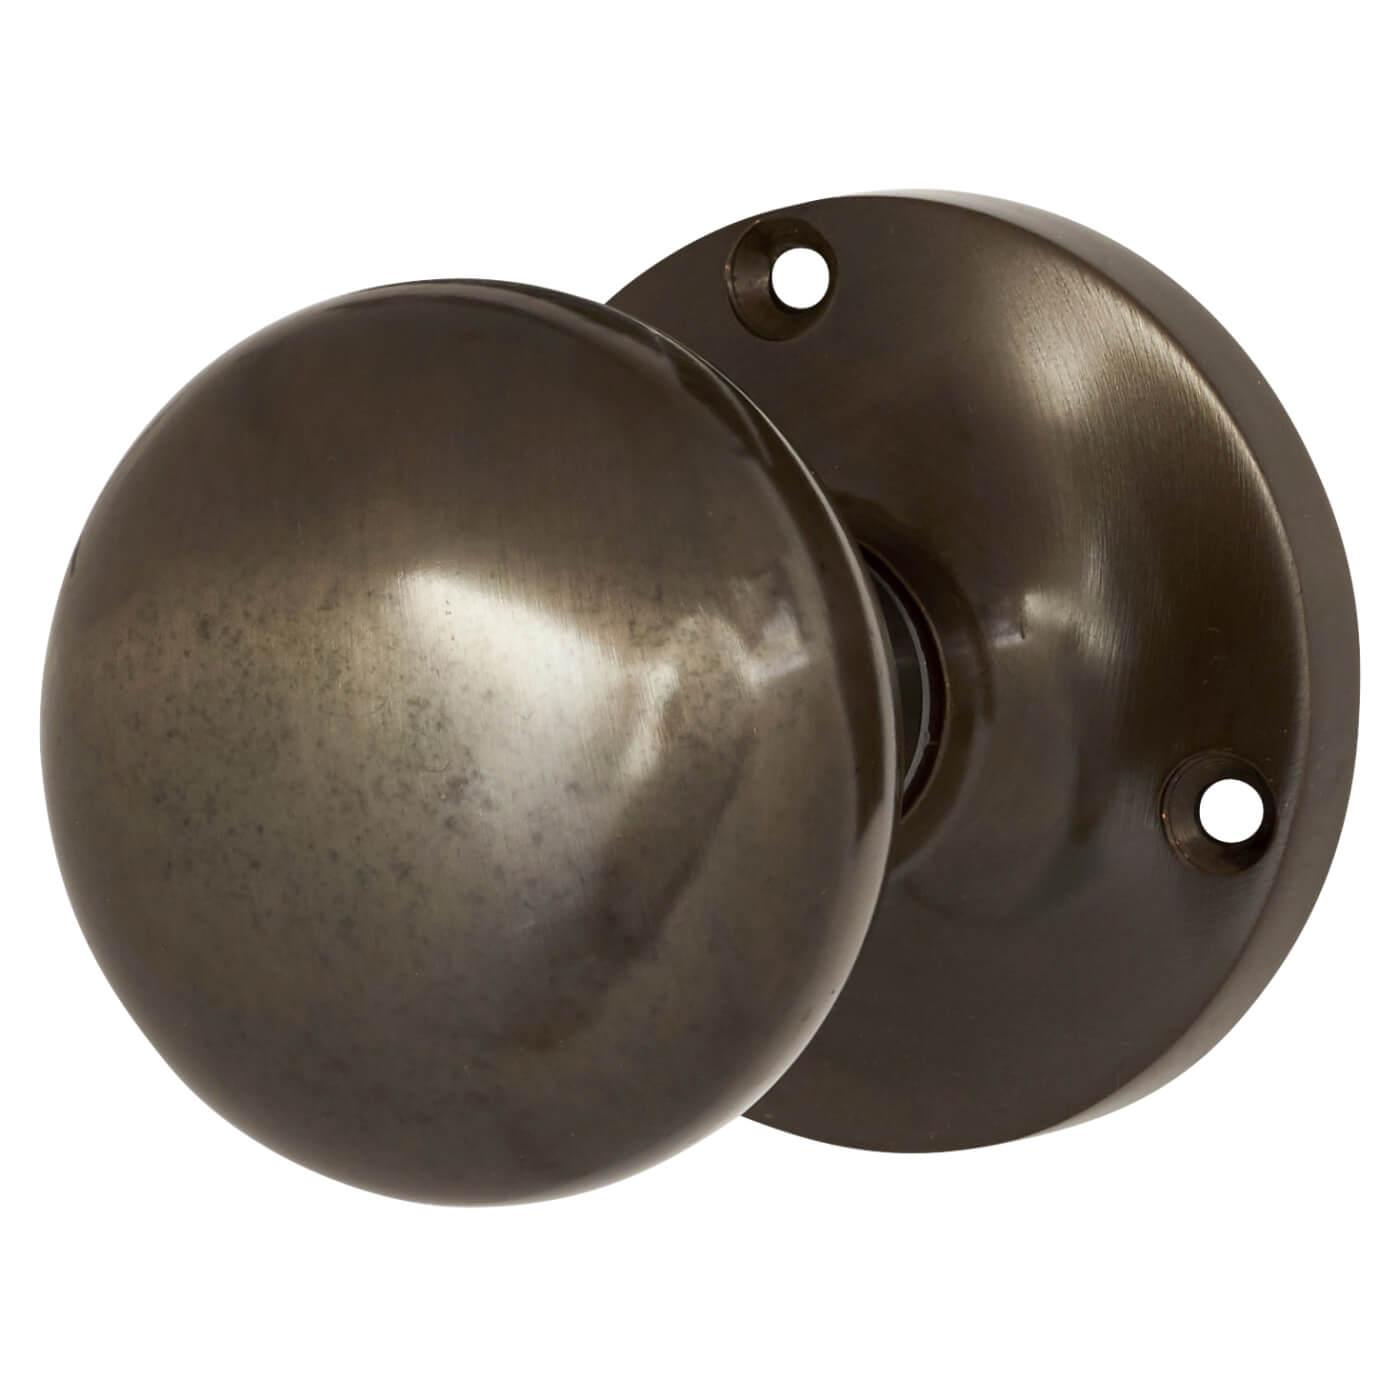 Jedo Mushroom Mortice Door Knob Dark Bronze